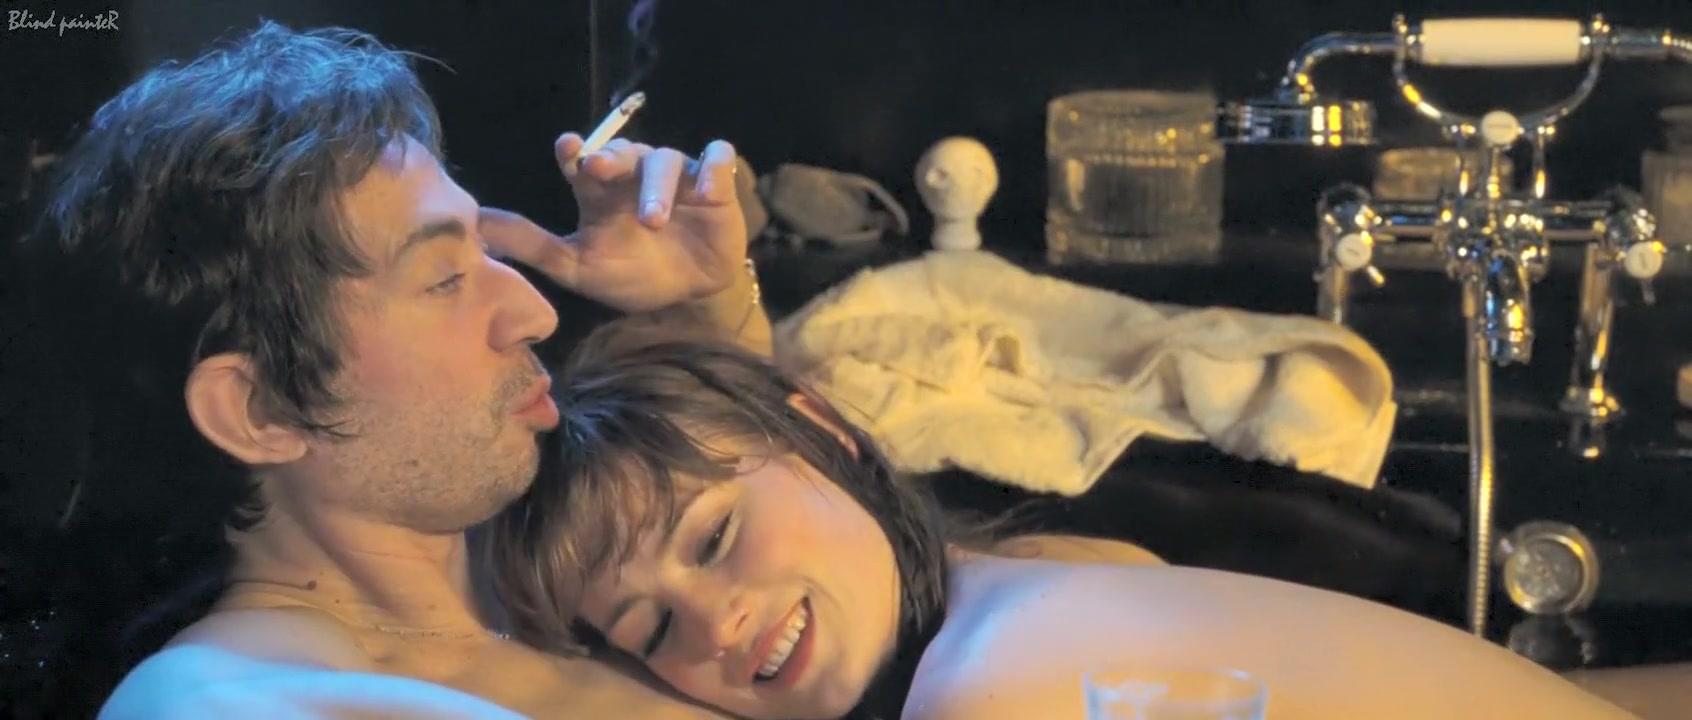 Gainsbourg (2010) Lucy Gordon free safe gf porn pics